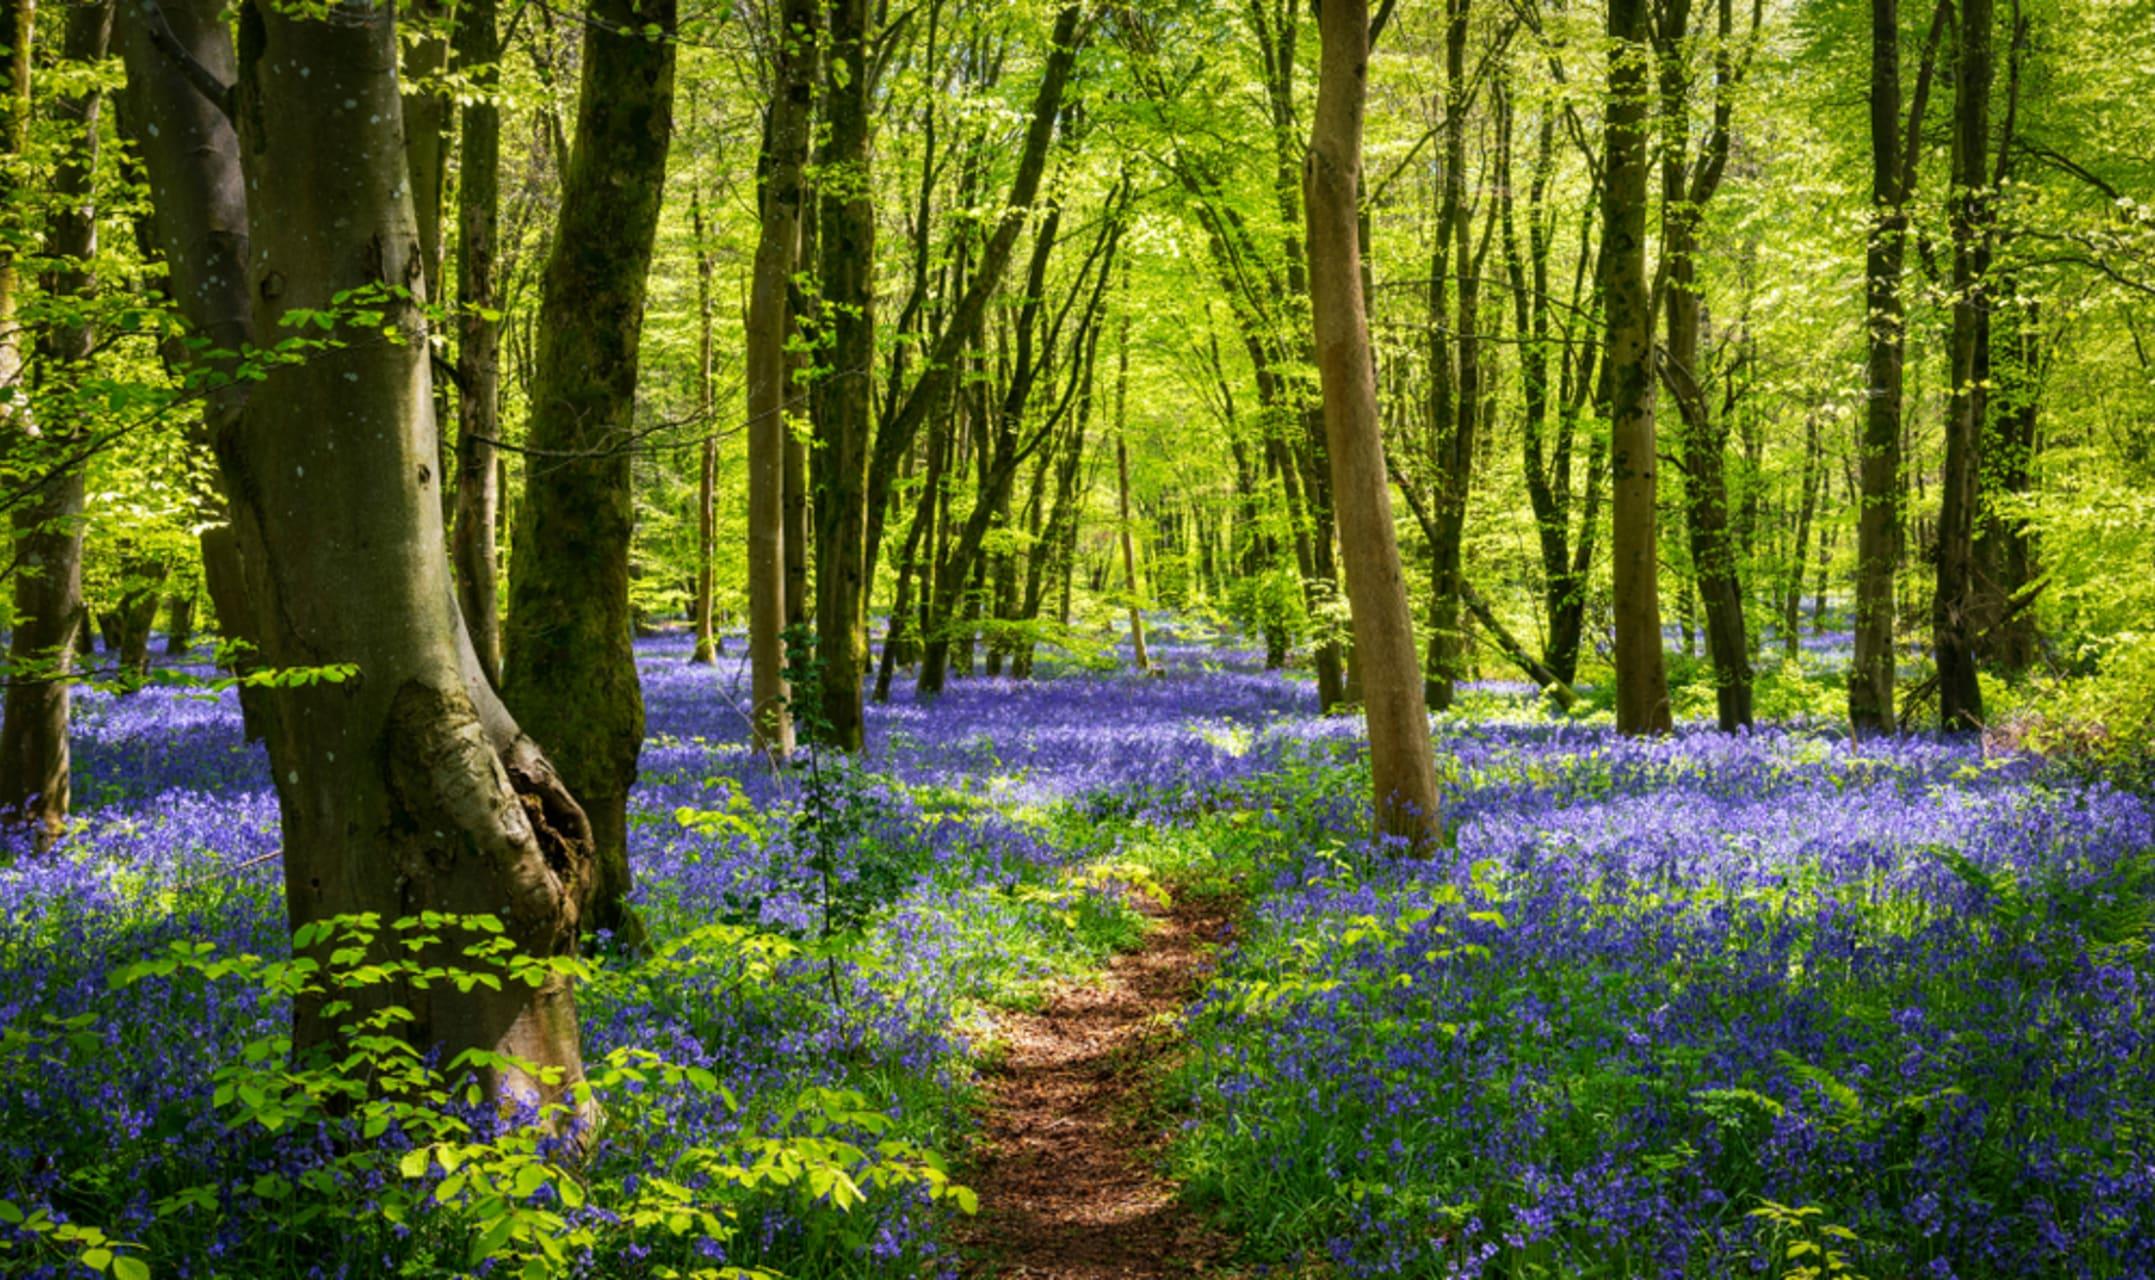 Guernsey - Wander through Bluebell Wood in Guernsey